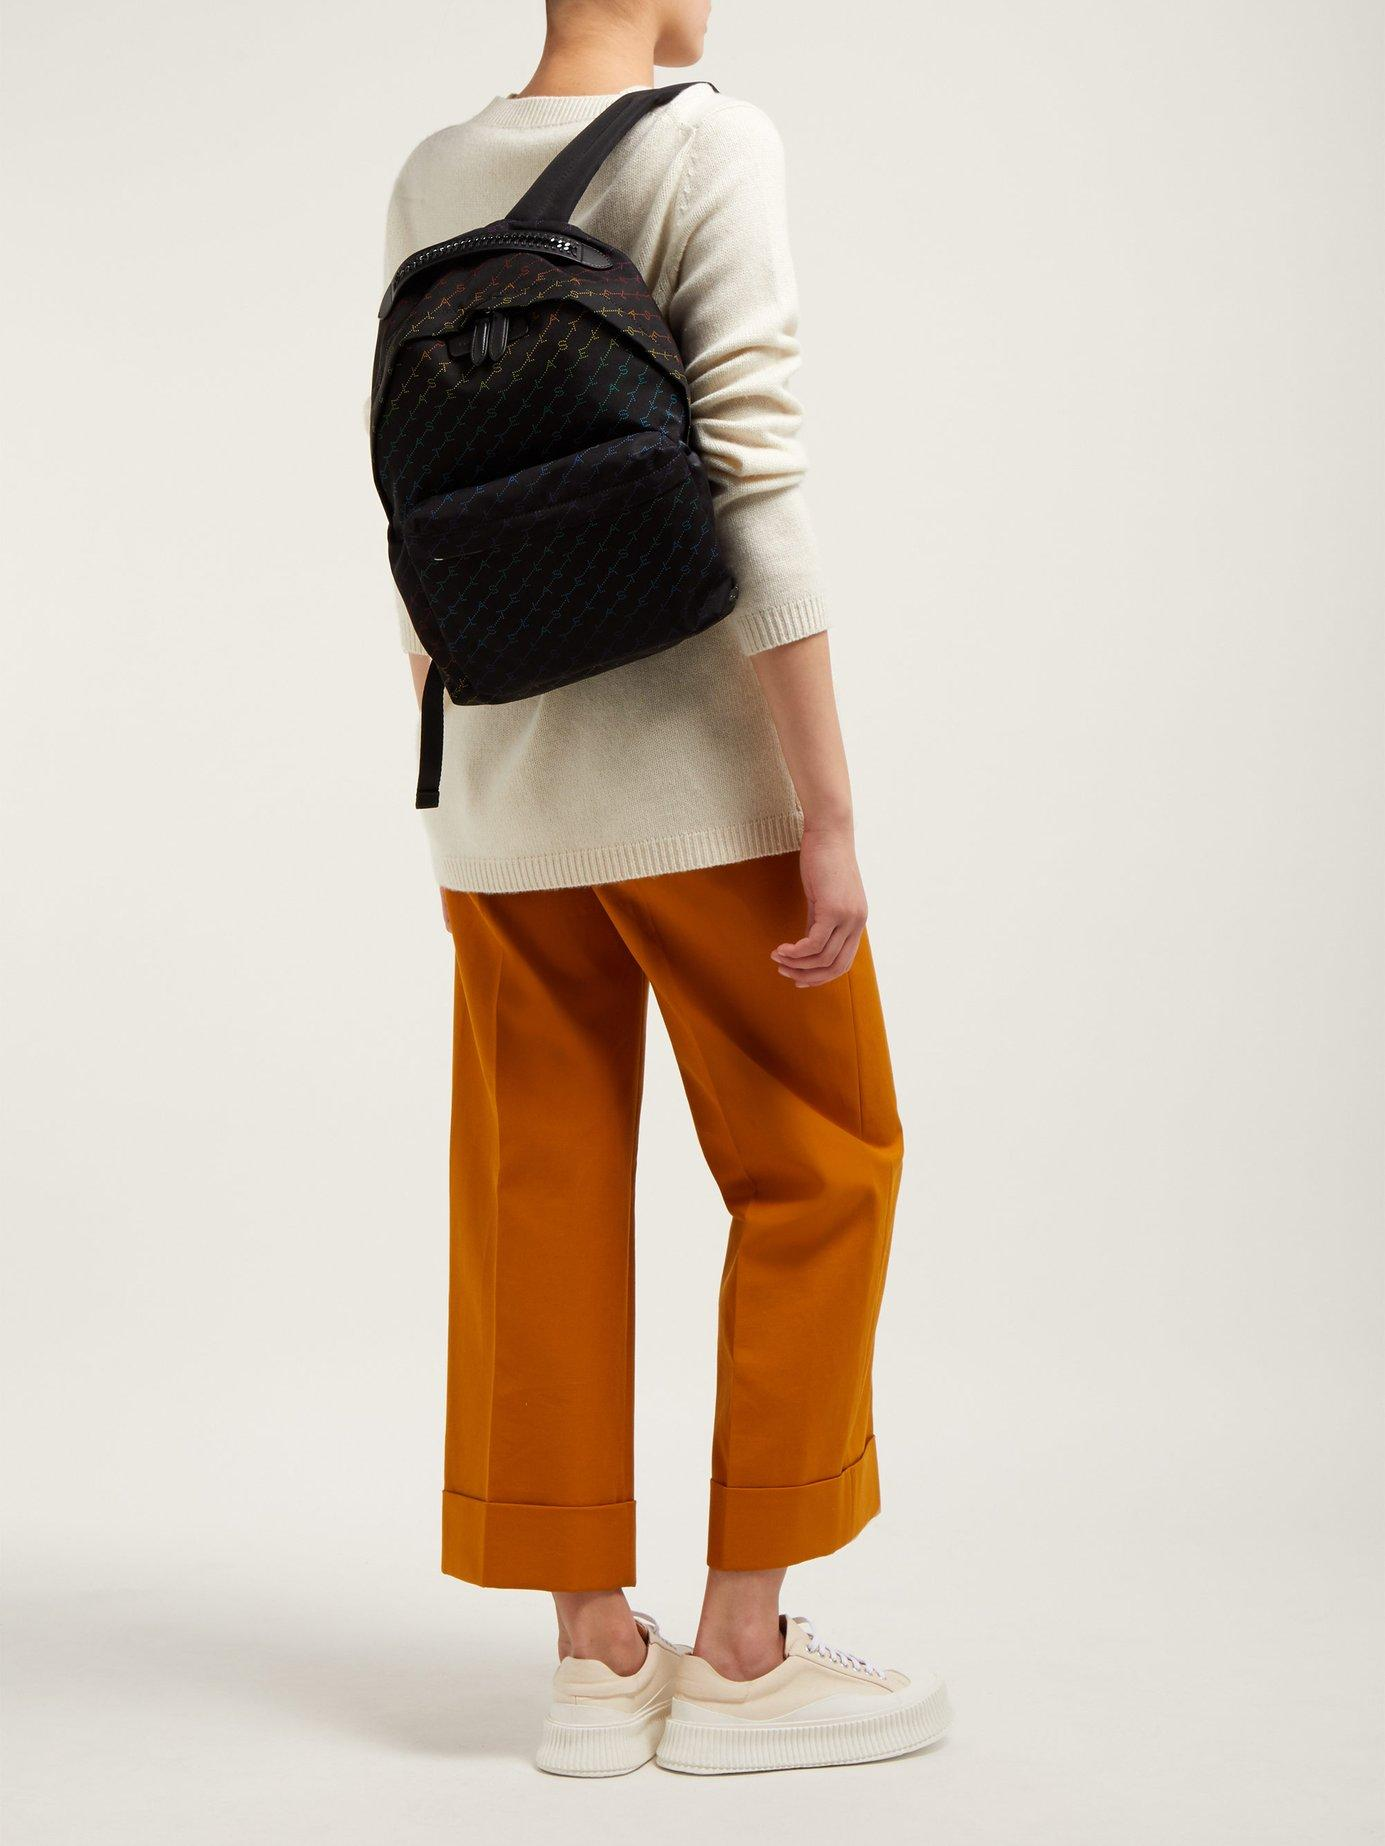 29d1bee4d8f0 Stella McCartney - Black Falabella Rainbow Logo Print Nylon Backpack -  Lyst. View fullscreen